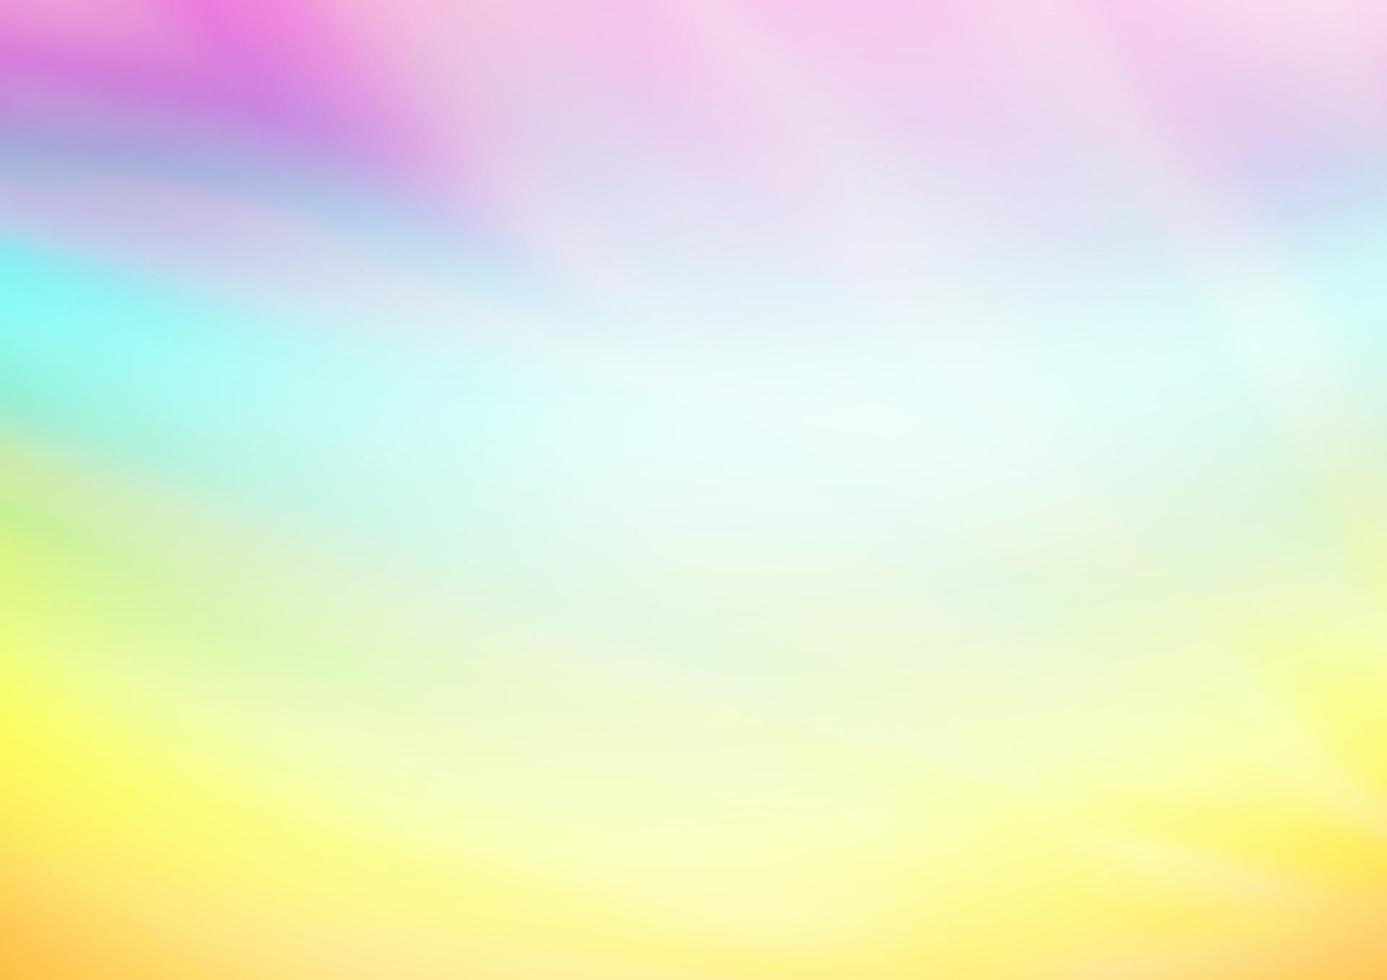 luz multicolorida, modelo abstrato brilhante de vetor de arco-íris.